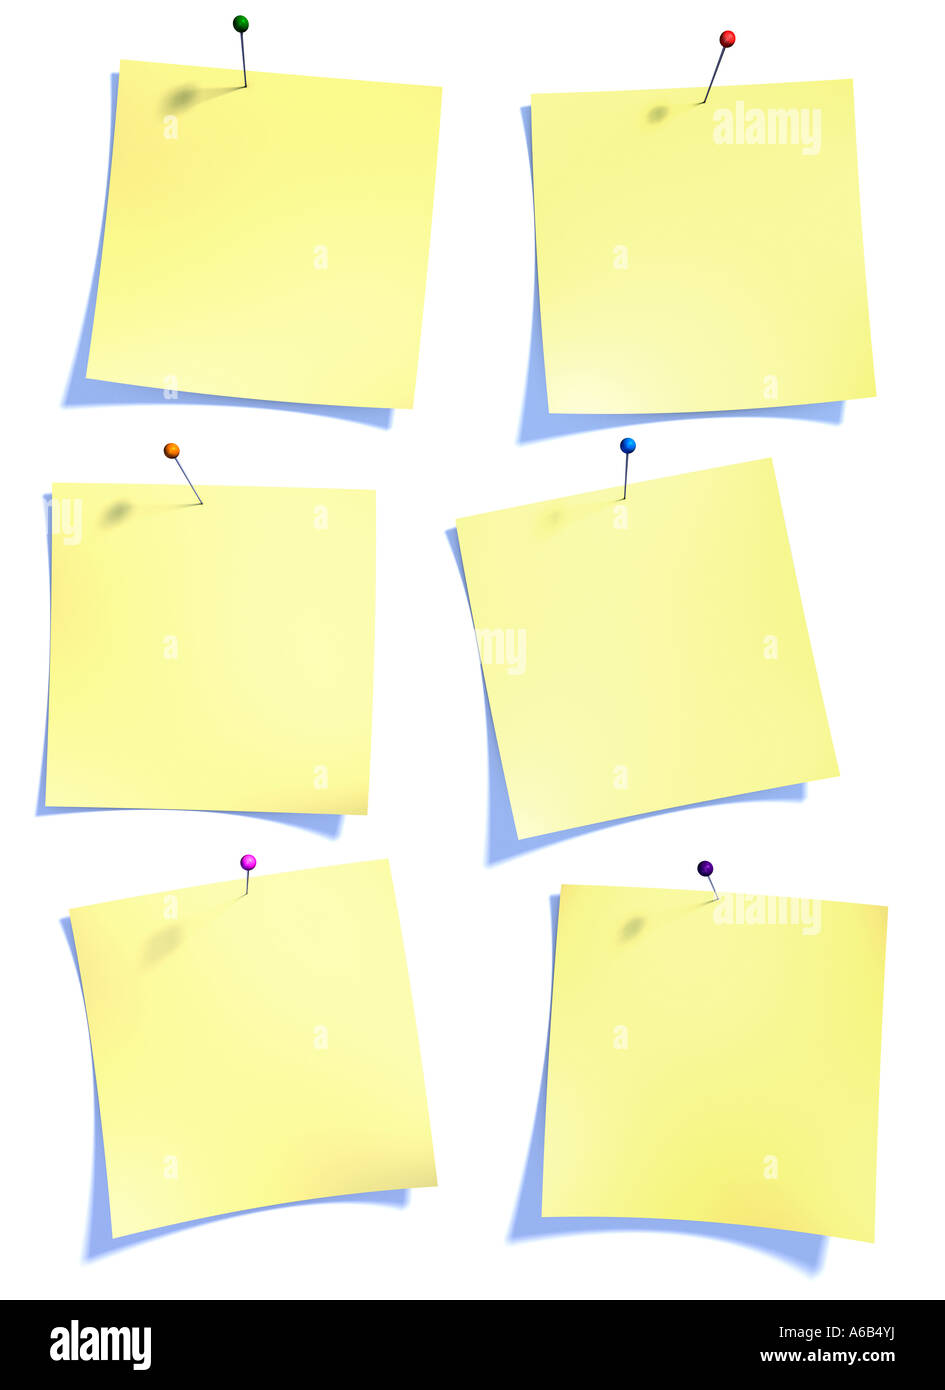 Posta cartacea è simbolo di office storrage di informazioni forum blog Immagini Stock